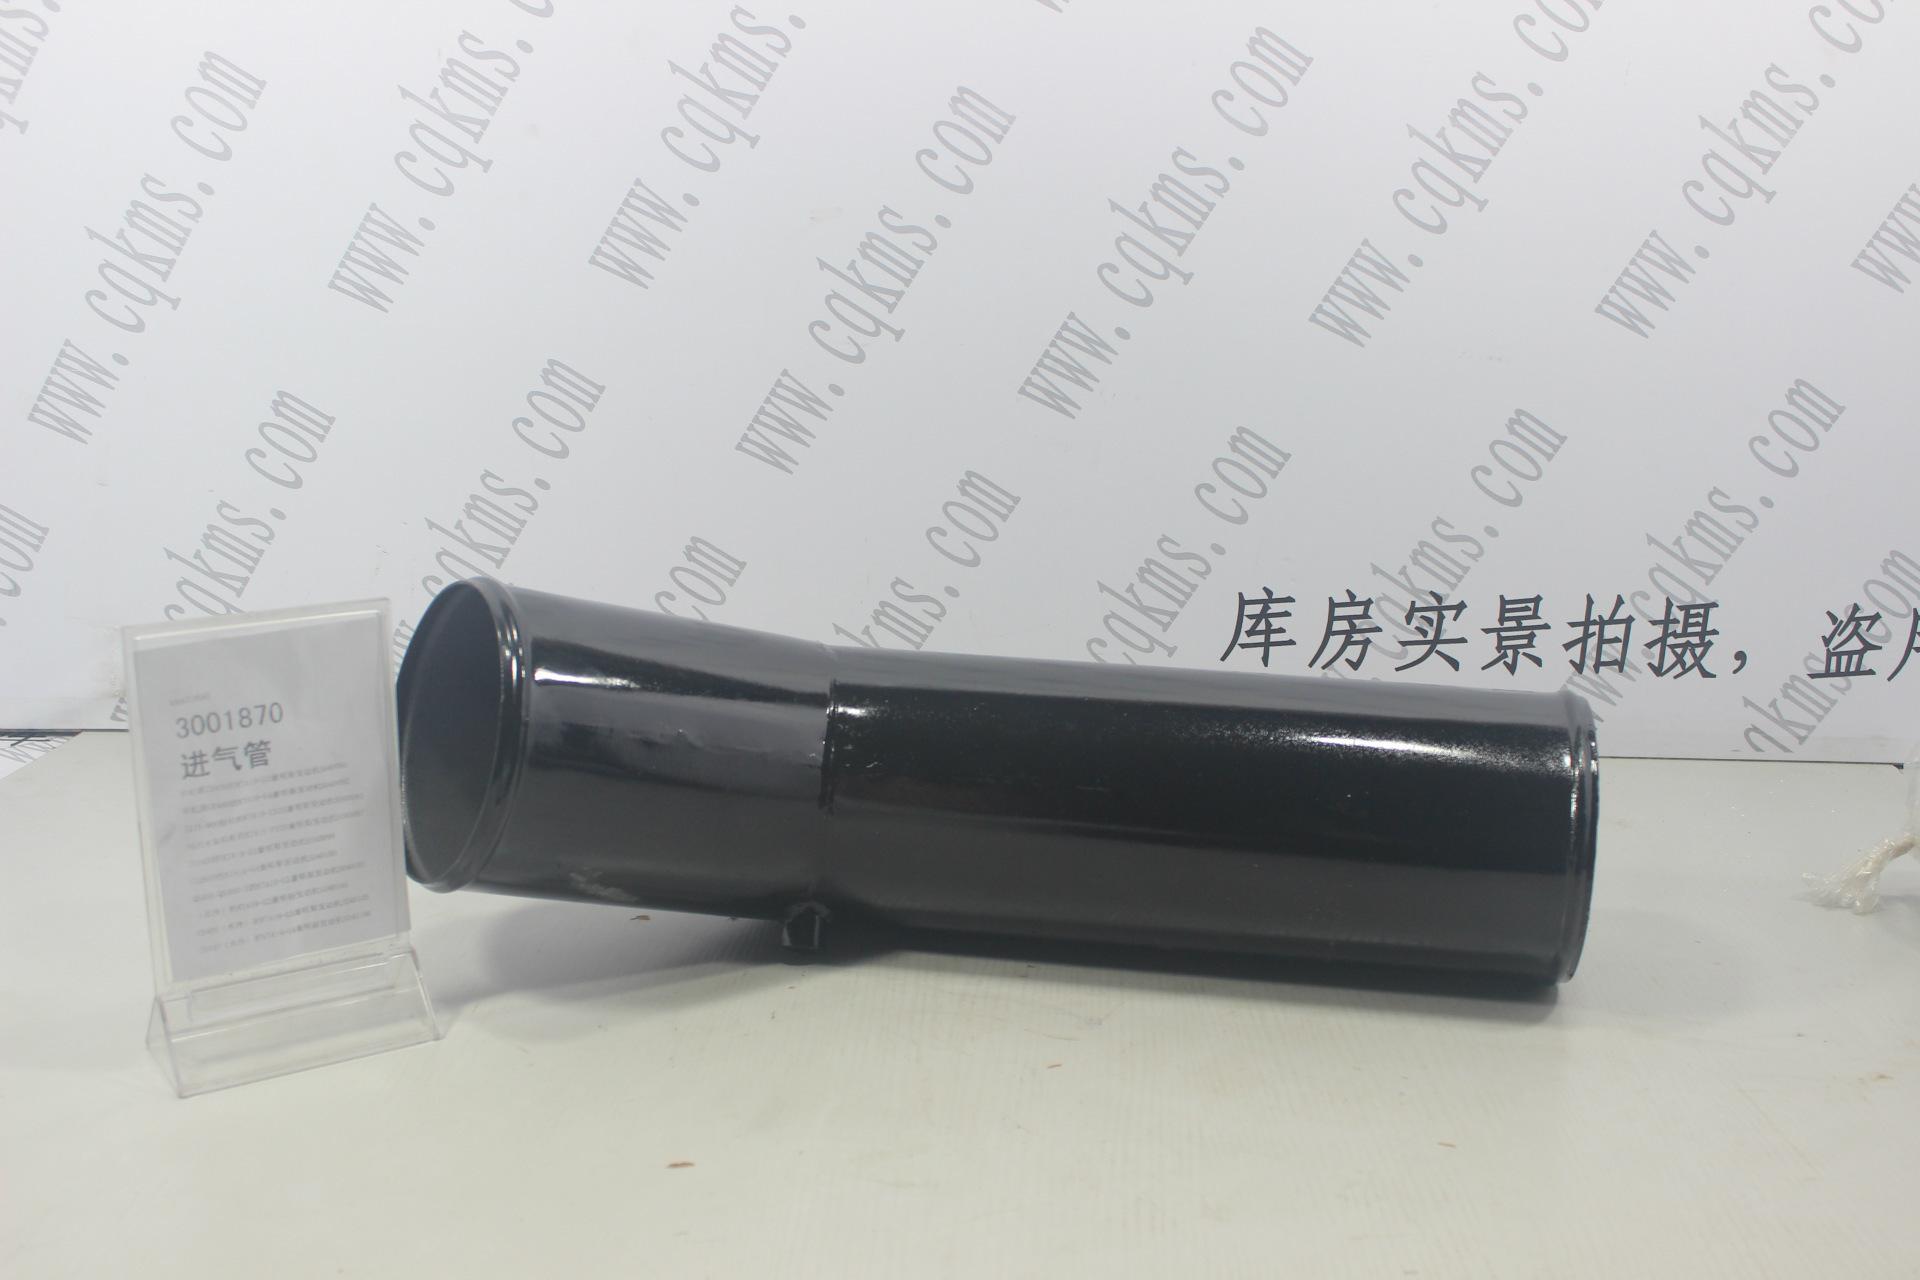 kms01690-3001870-进气管-用于K19康明斯发动机-K19-参考规格外径13.8cm,内径13.5cm-参考重量3.065Kg-3.065Kg图片5